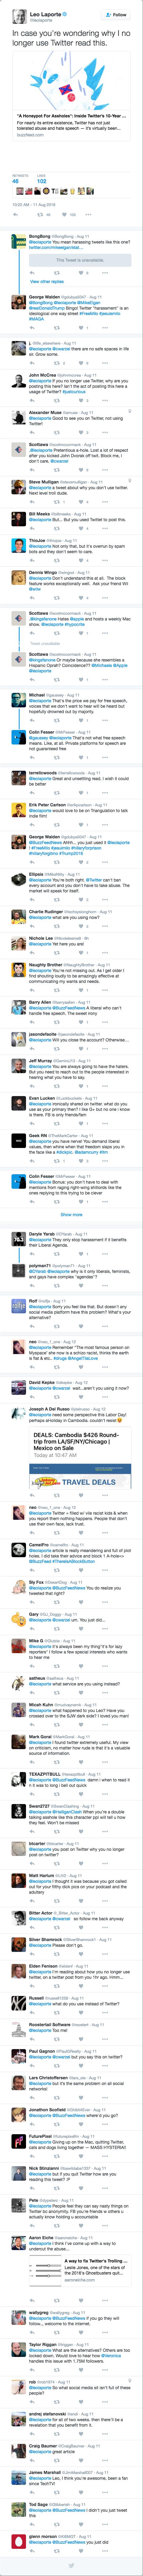 Reactions to Leo Laporte on Twitter